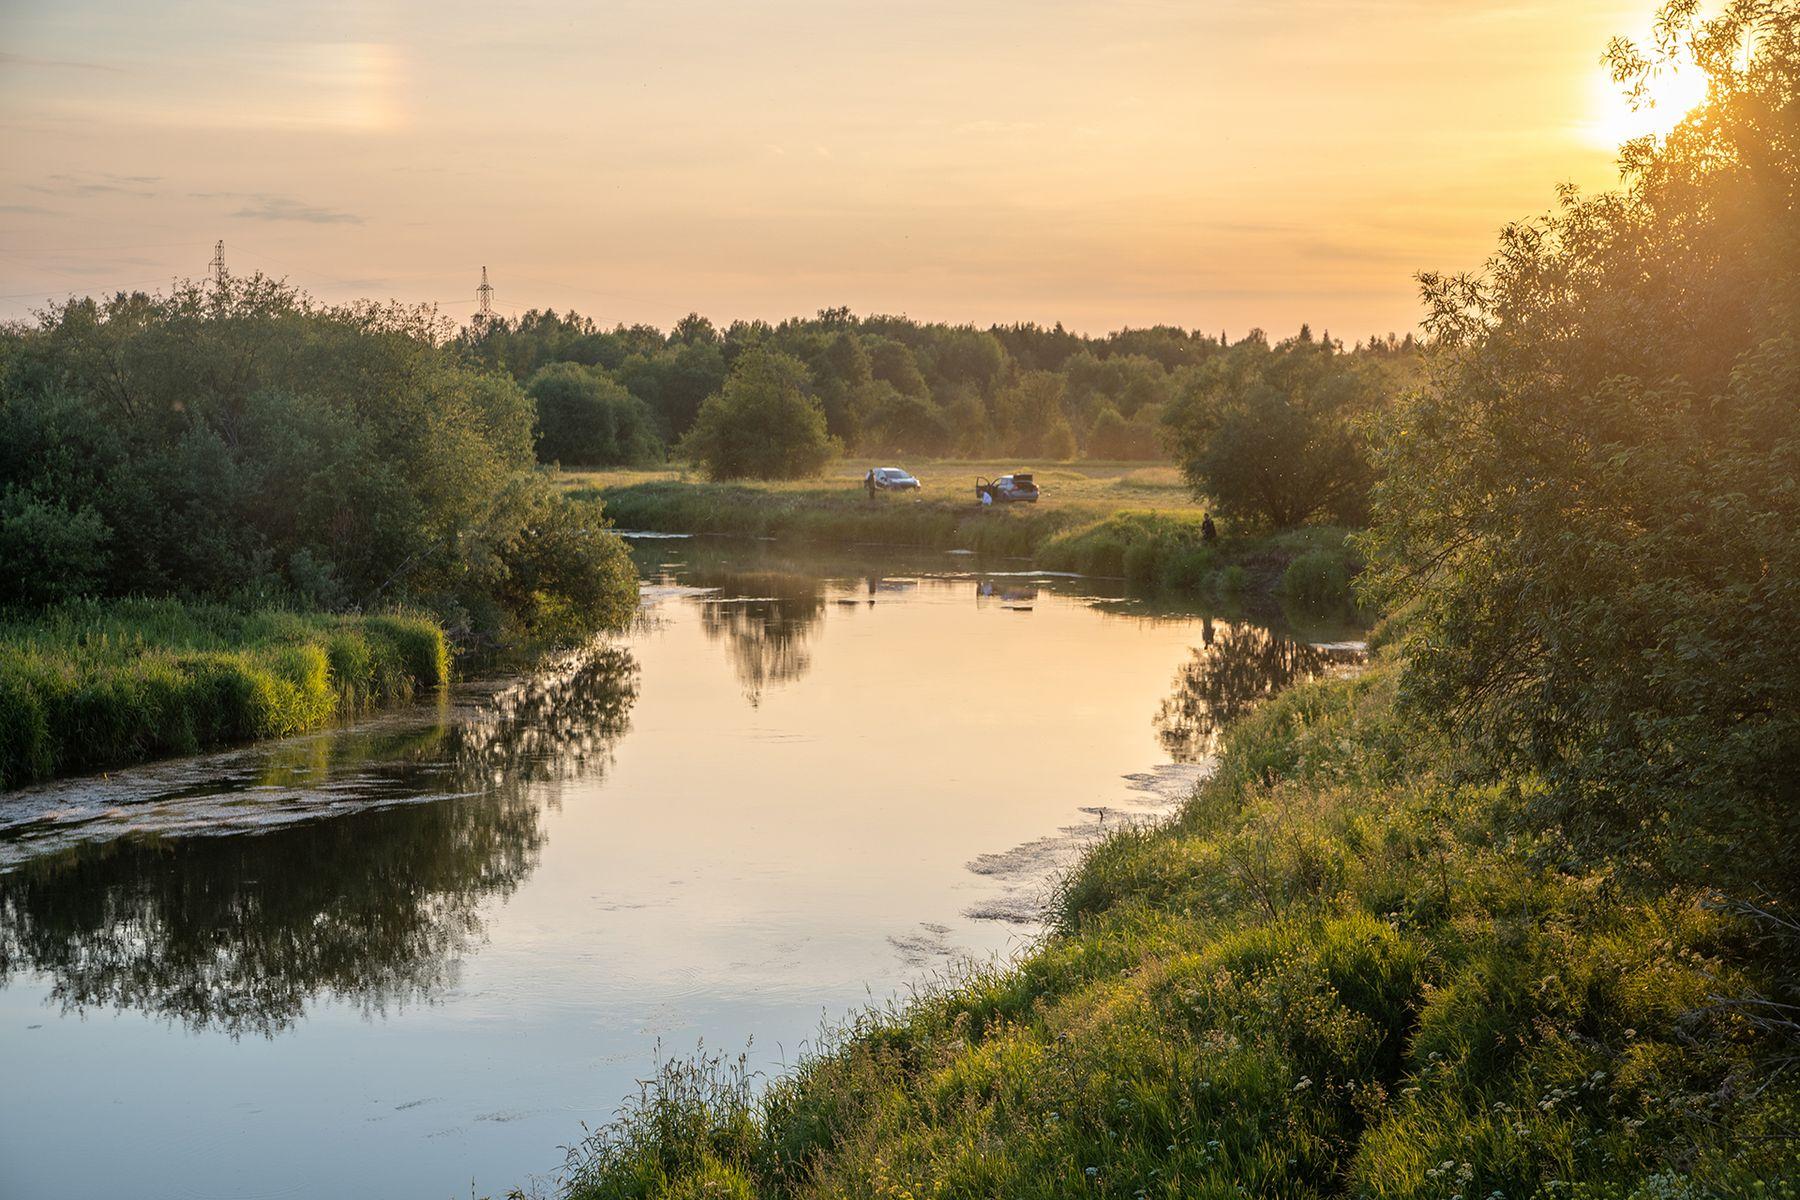 Летний вечер река природа Пермский_край пейзаж небо Лысьва лето закат вечер